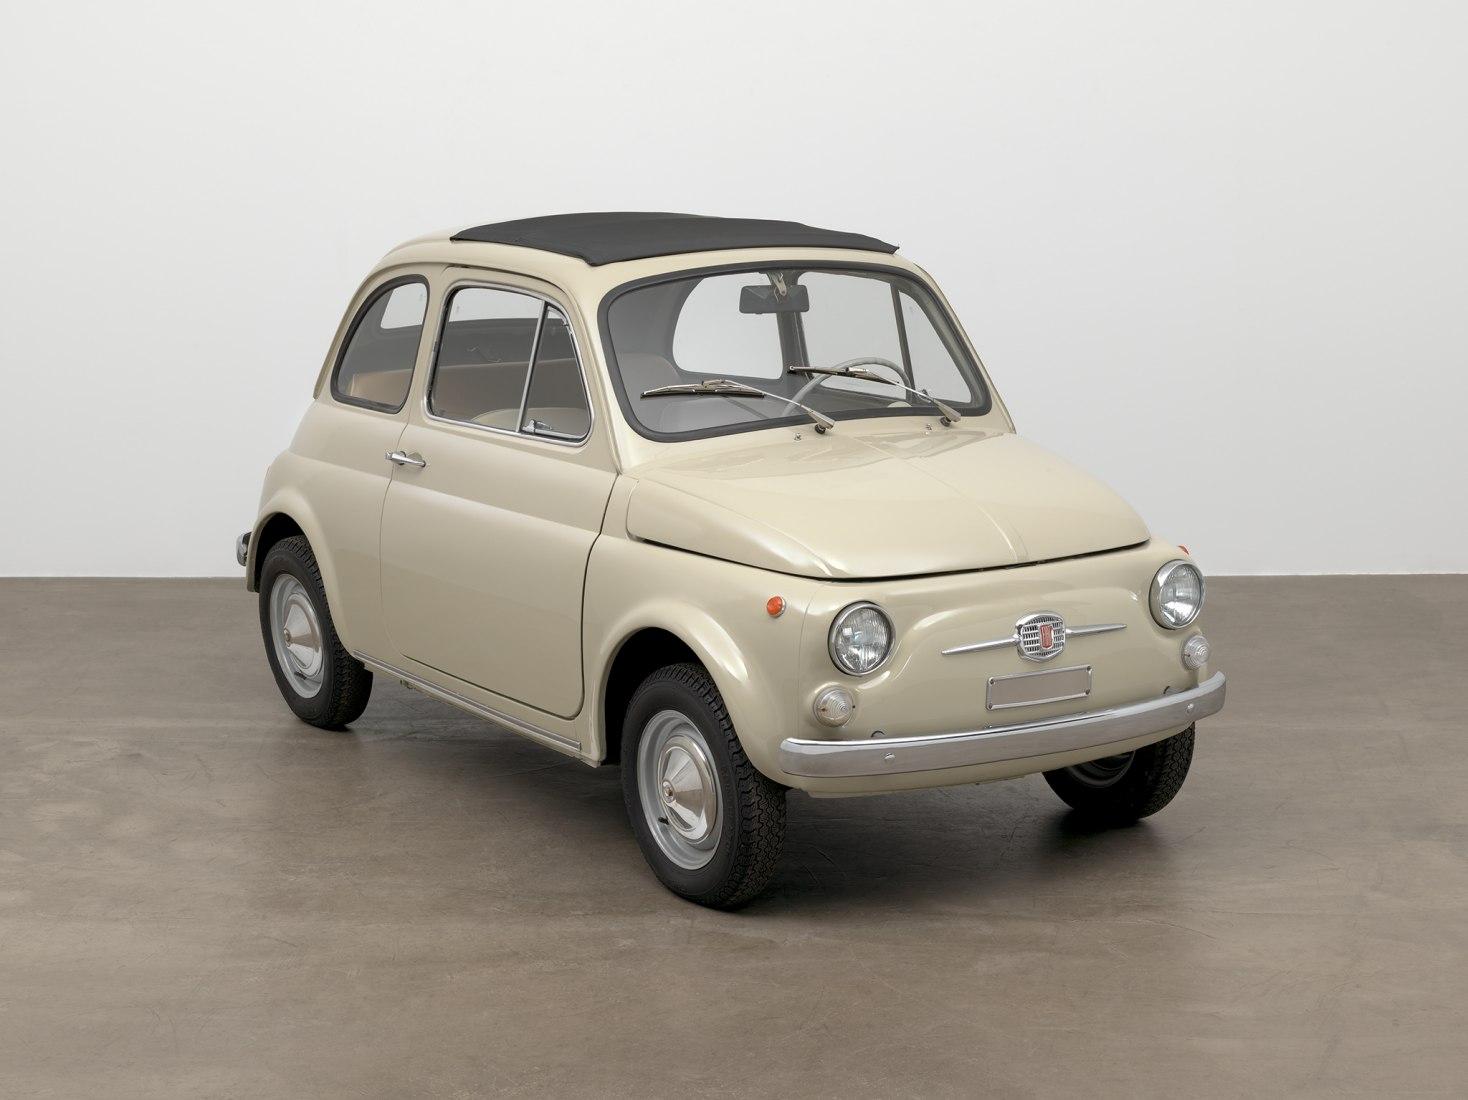 Original-condition 1968 Fiat 500. MoMA's Collection.